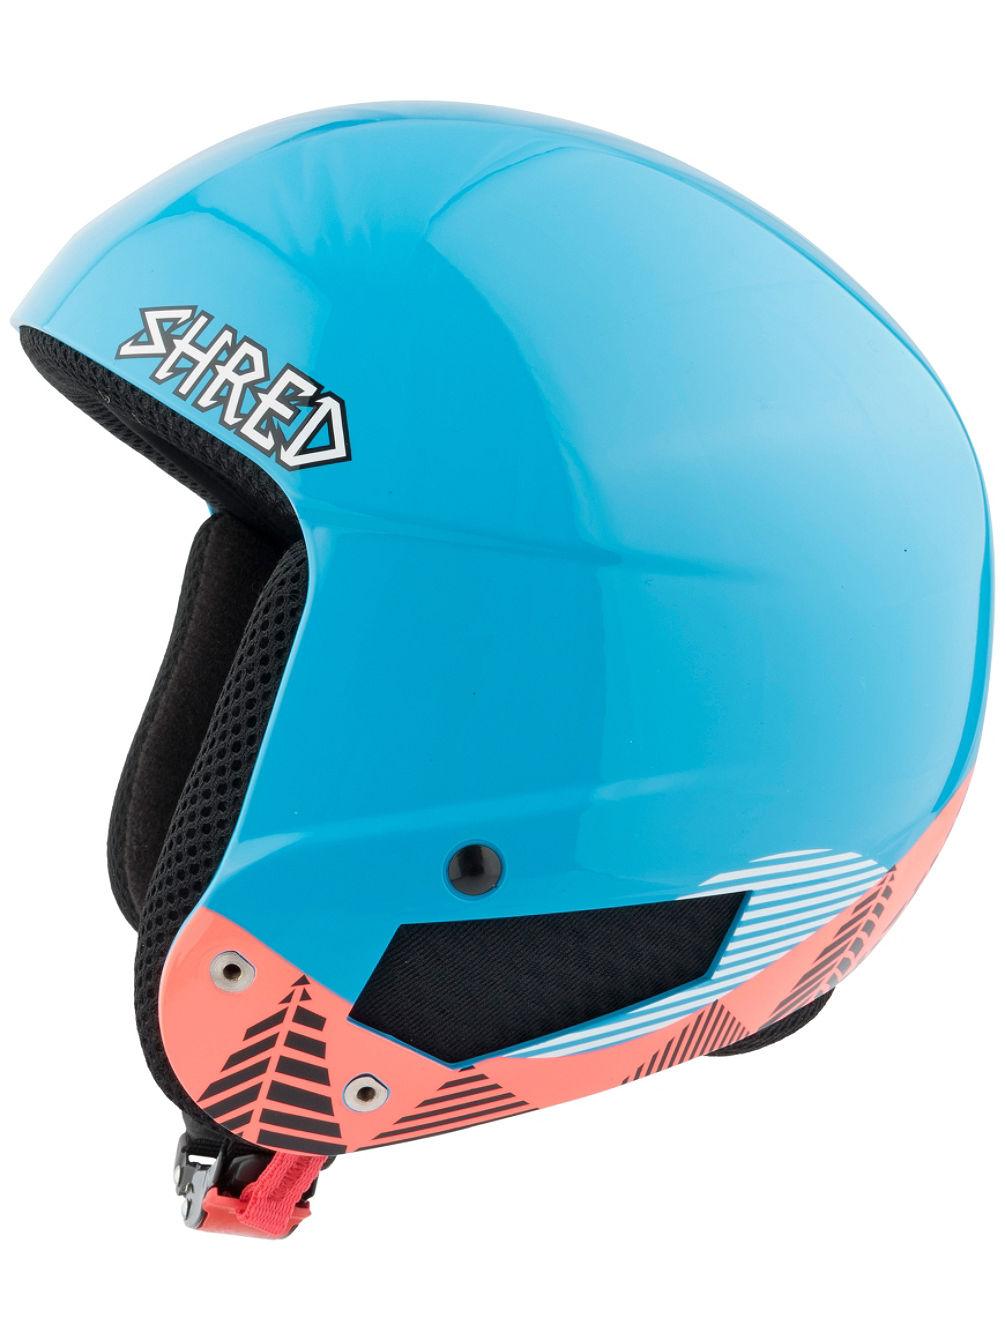 Buy Shred Mbb Rh Helmet online at blue-tomato.com 9339eb1c510